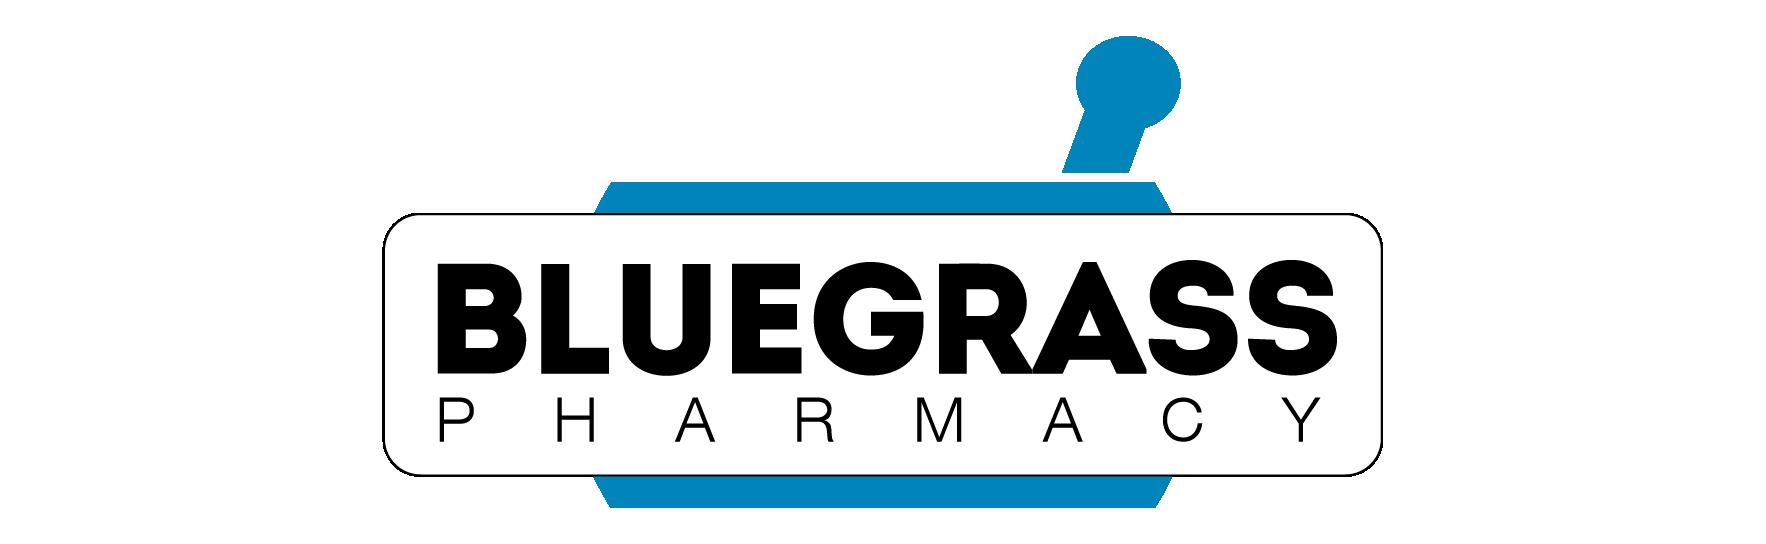 Bluegrass LTC Pharmacy